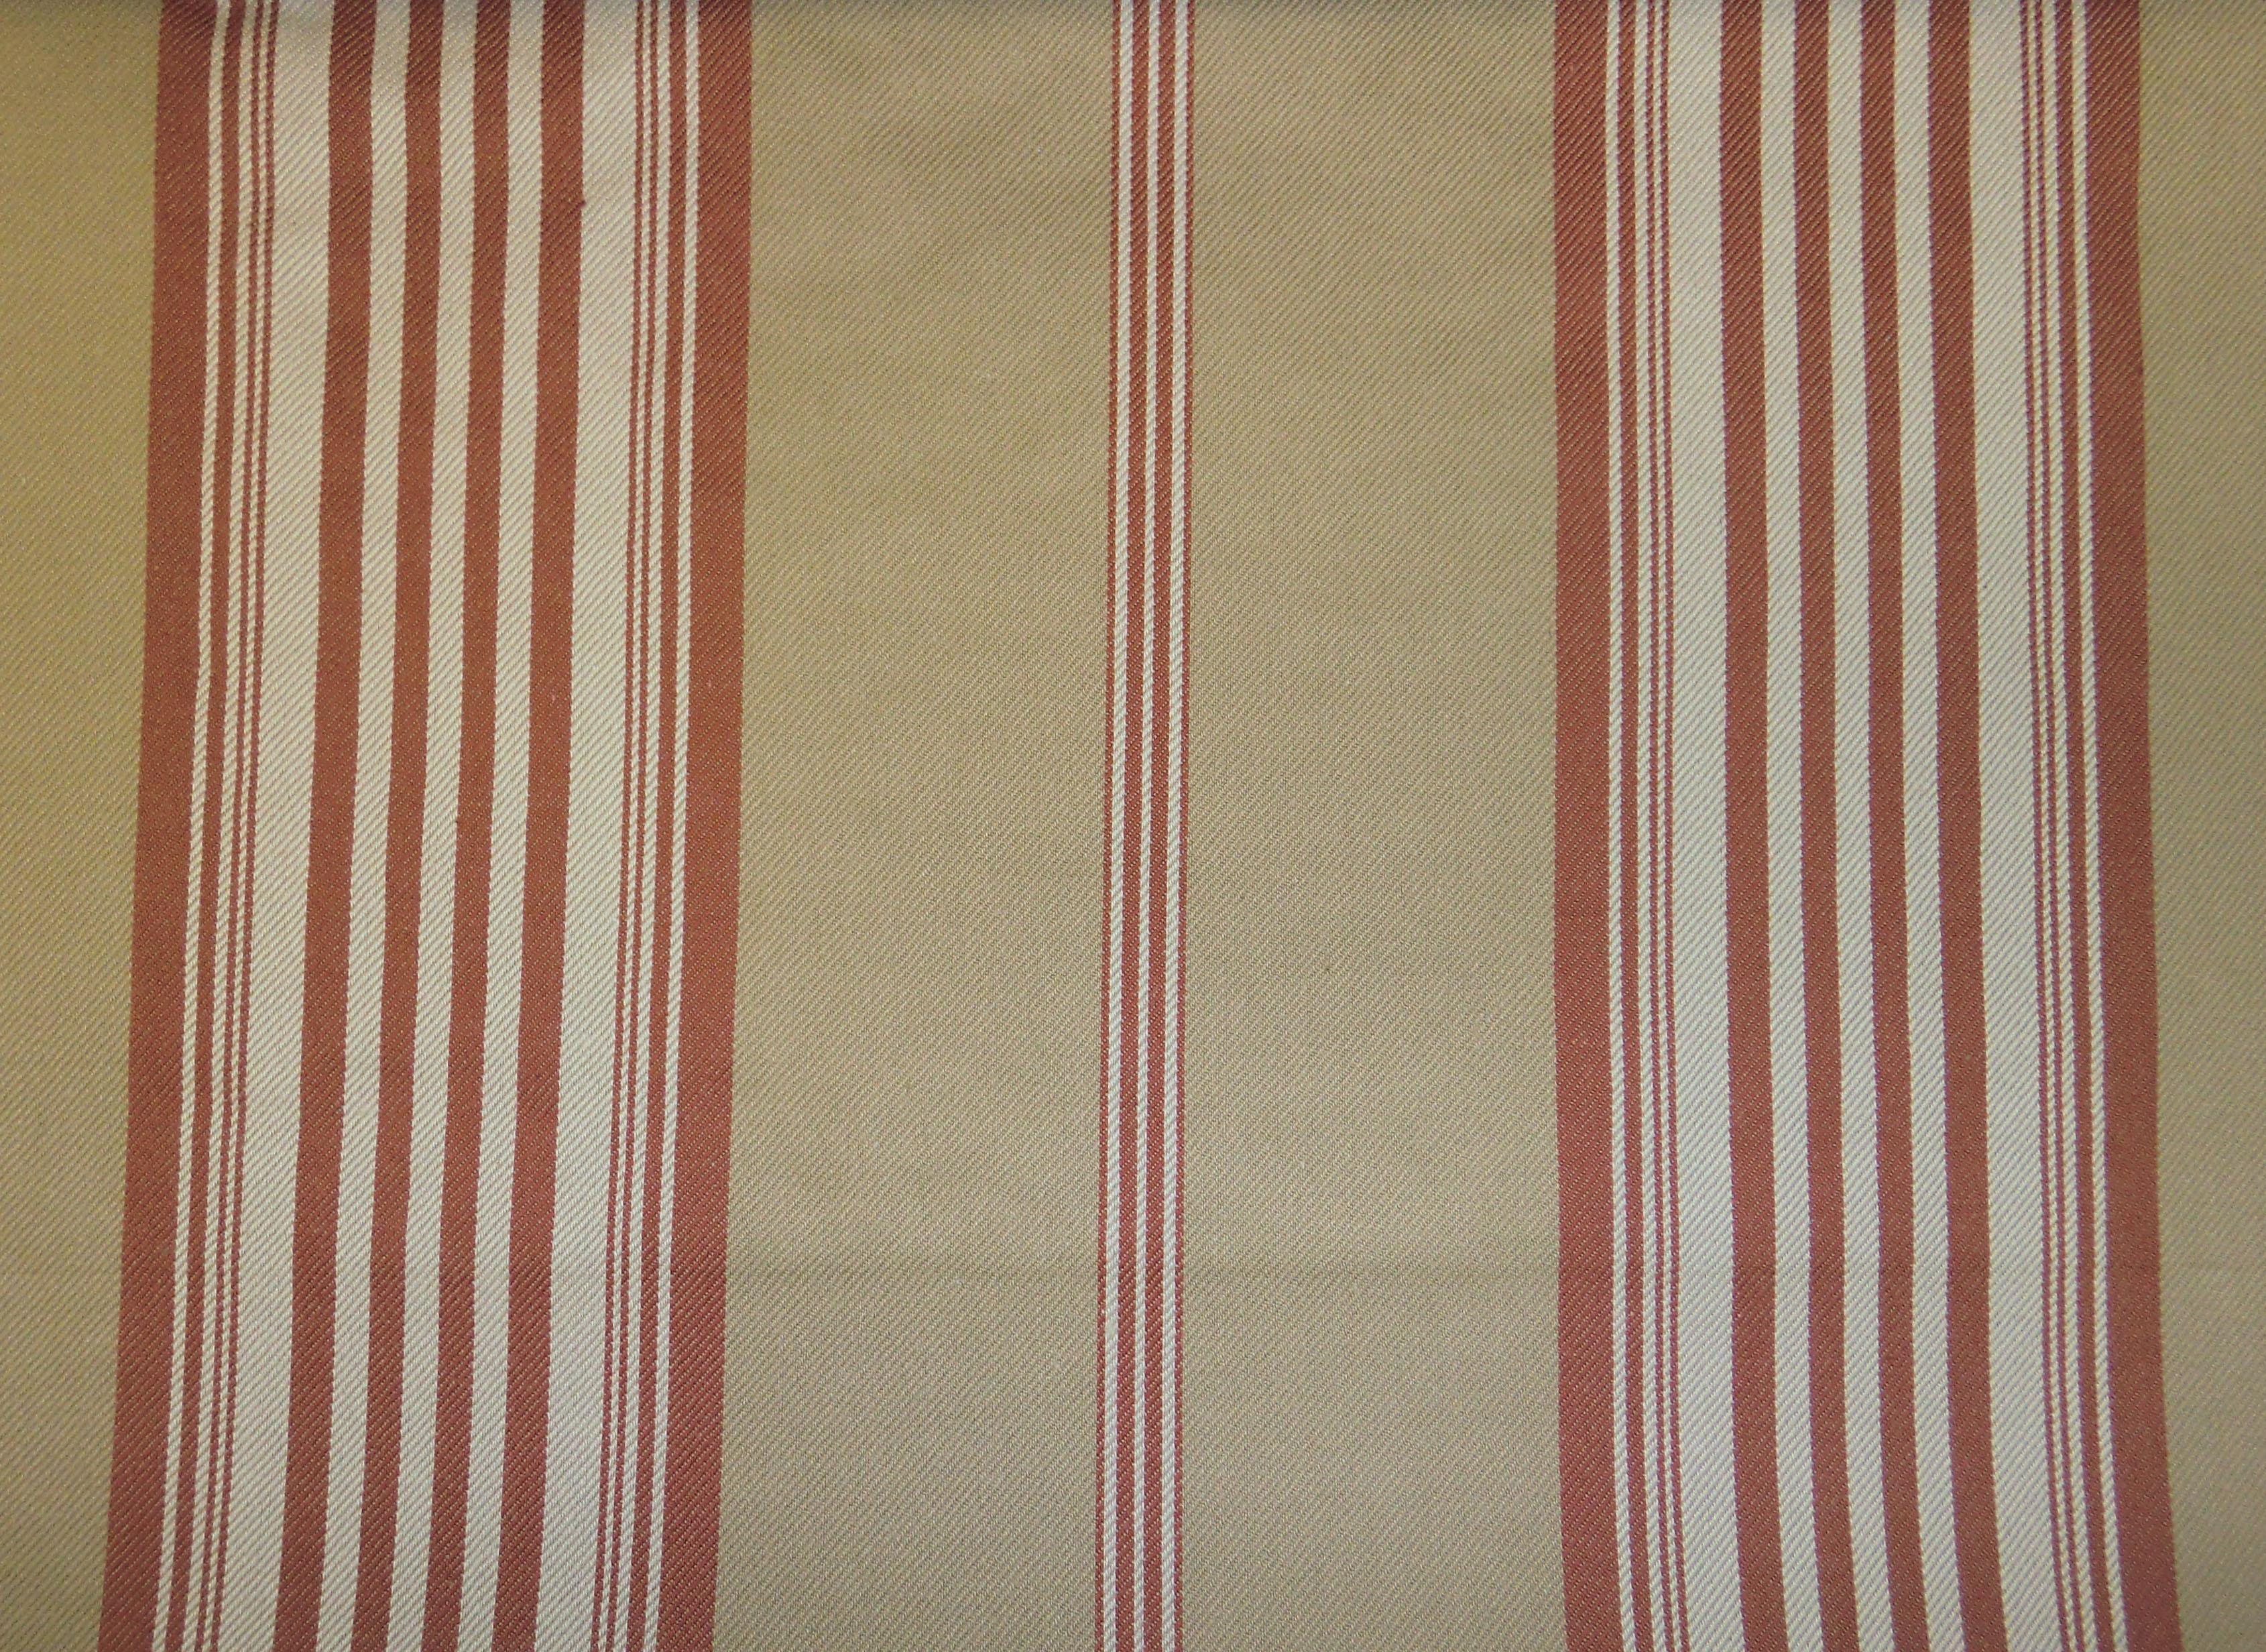 Ralph Lauren Lila Ticking Stripe Red Fabric Ticking Stripe